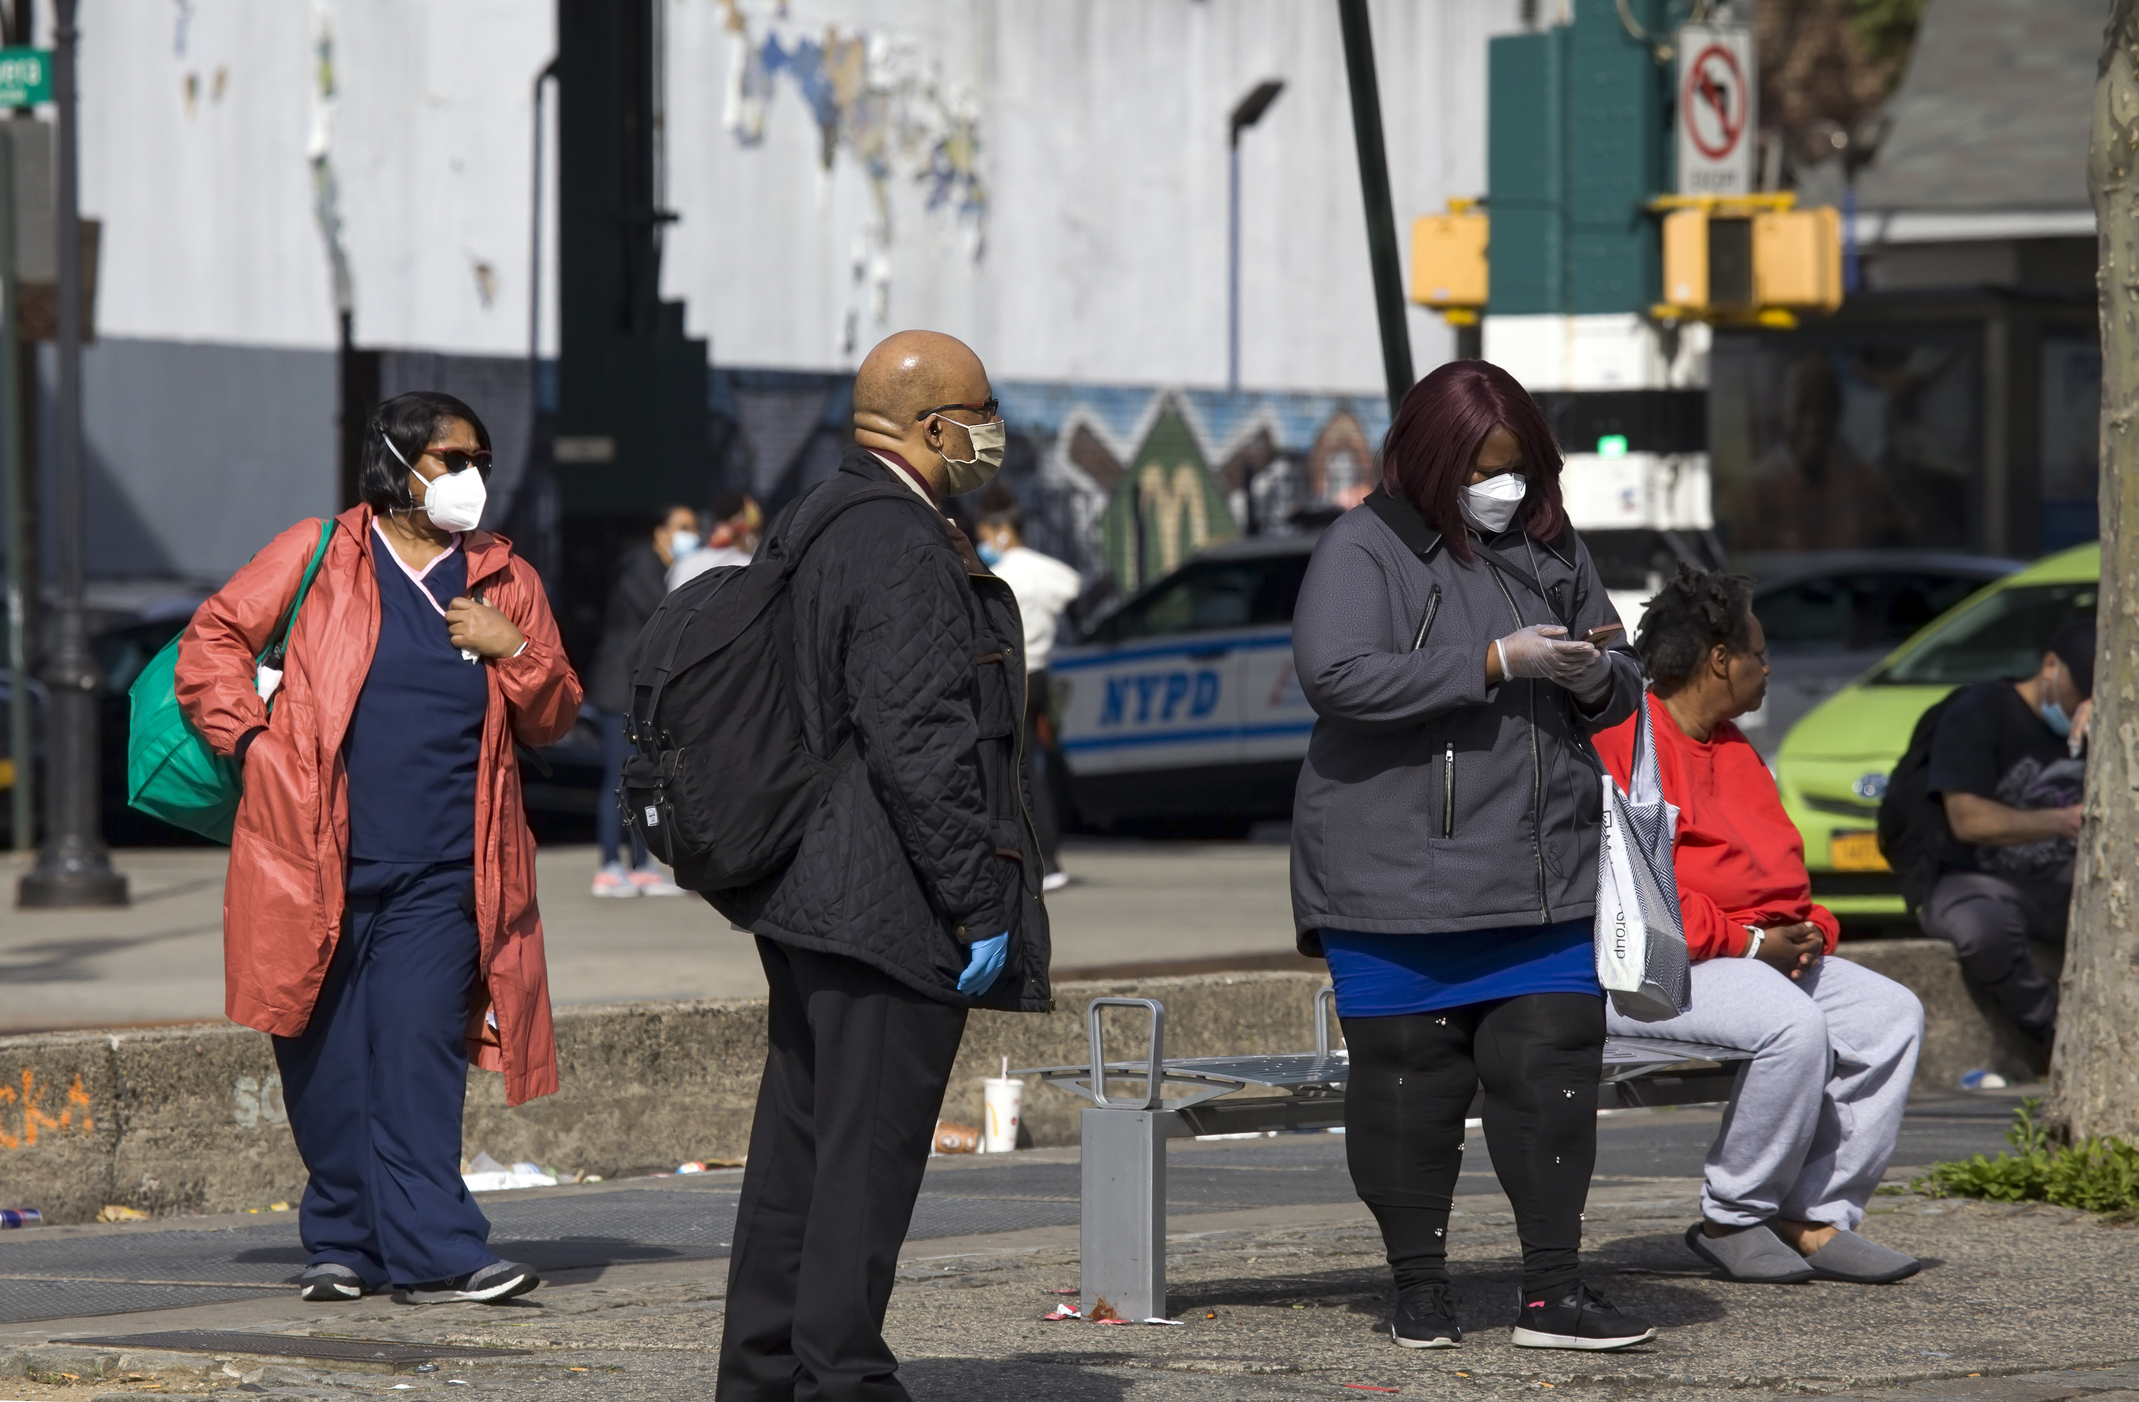 People wait for bus while wearing masks during COVID-19 Bronx NY. Image credit: eddtoro, iStock